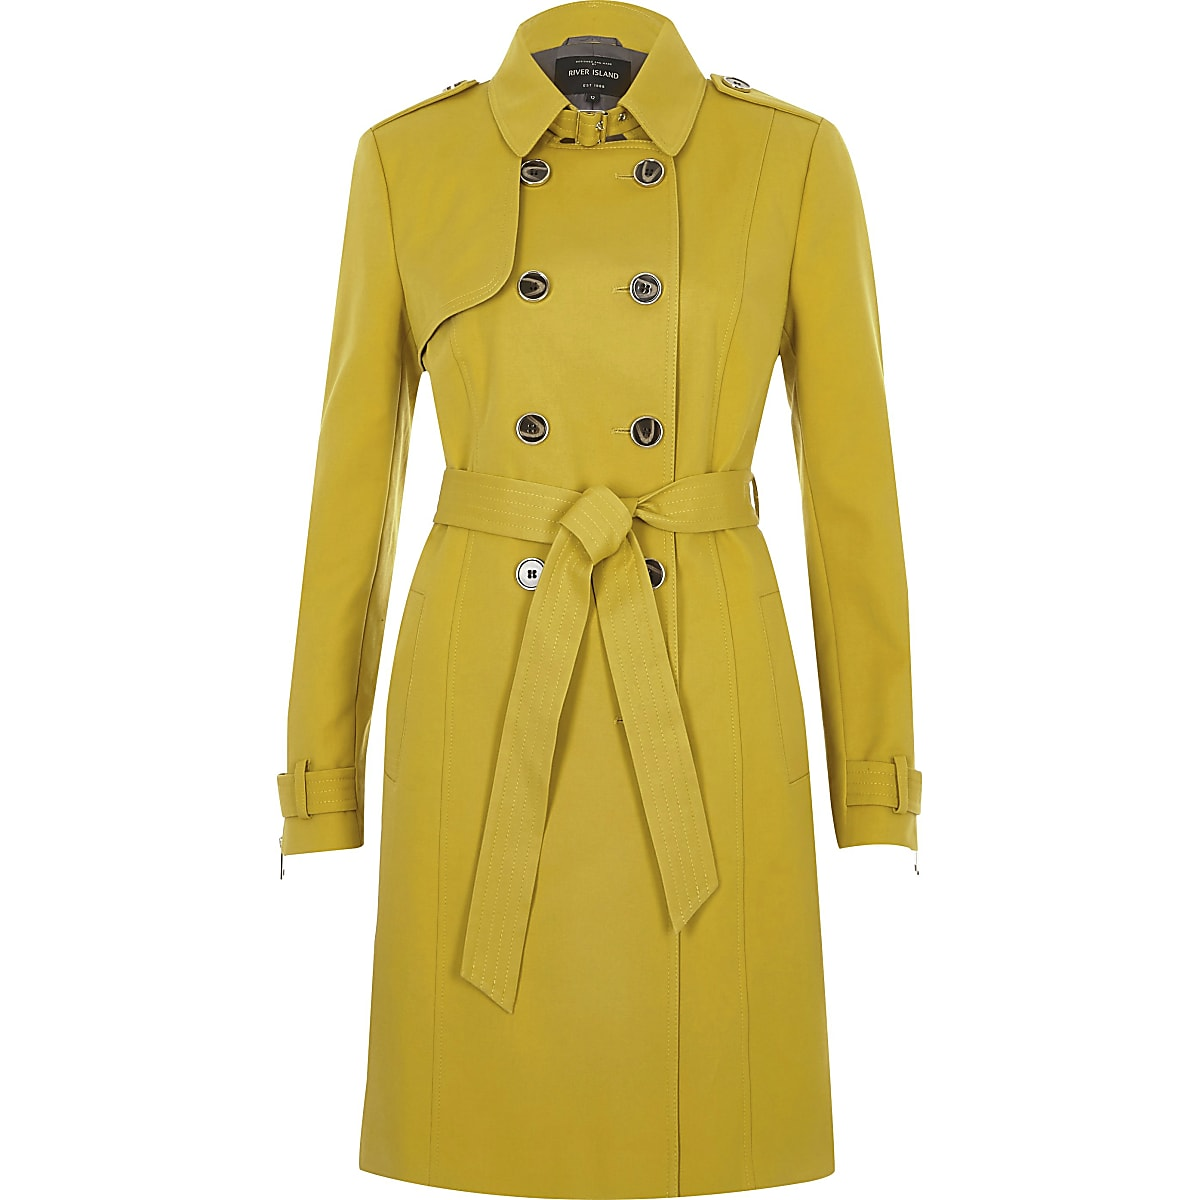 Yellow tie waist trench coat